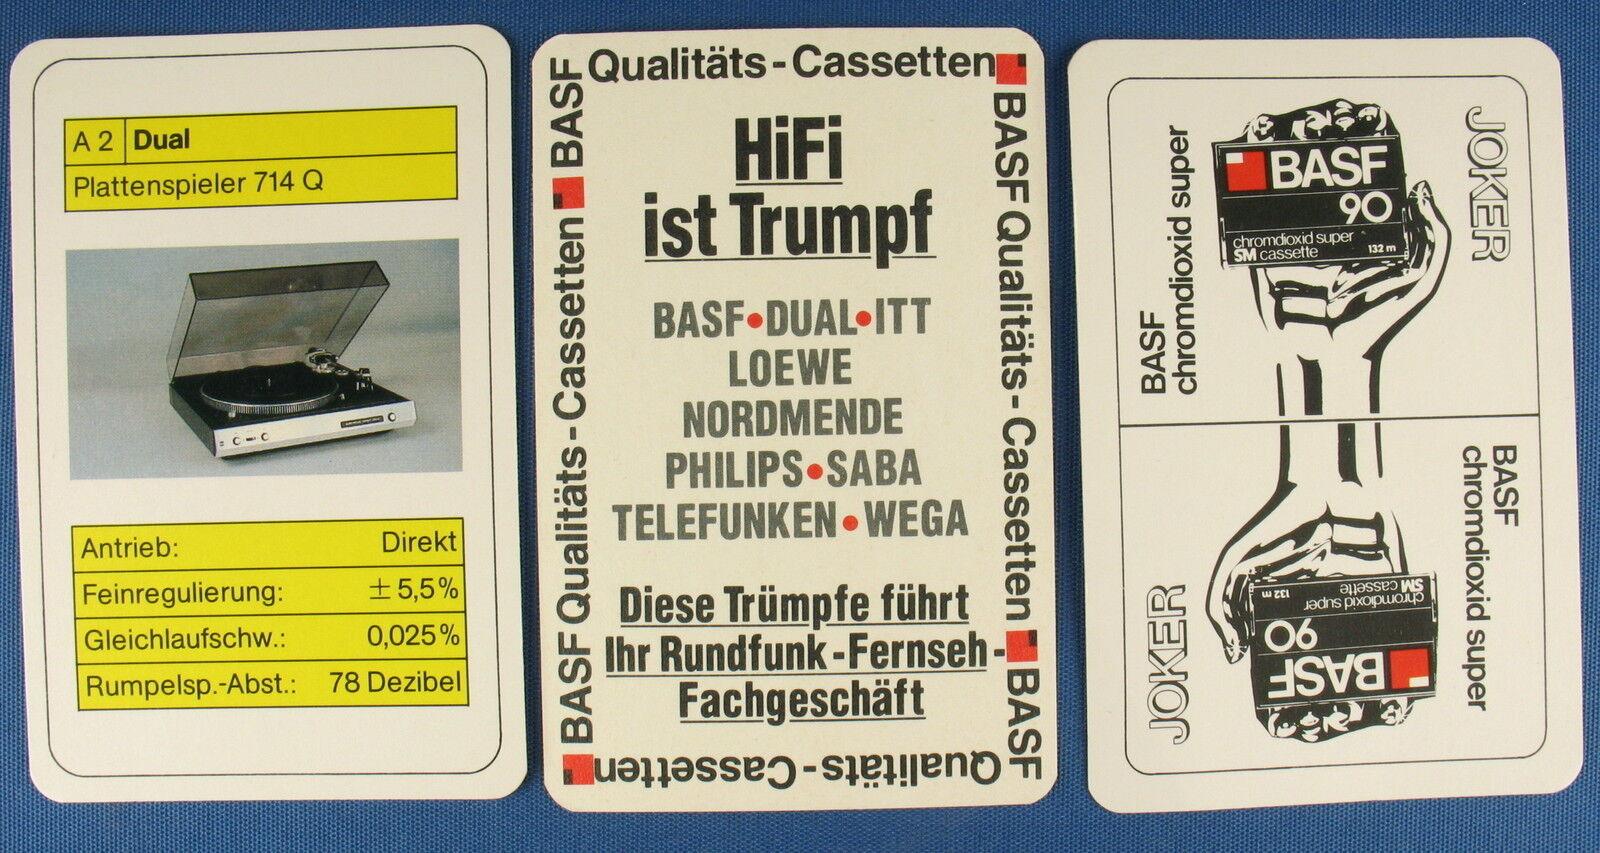 Quartett - BASF DUAL ITT - Werbequartett - LOEWE - NORDMENDE - PHILIPS SABA WEGA  | Charmantes Design